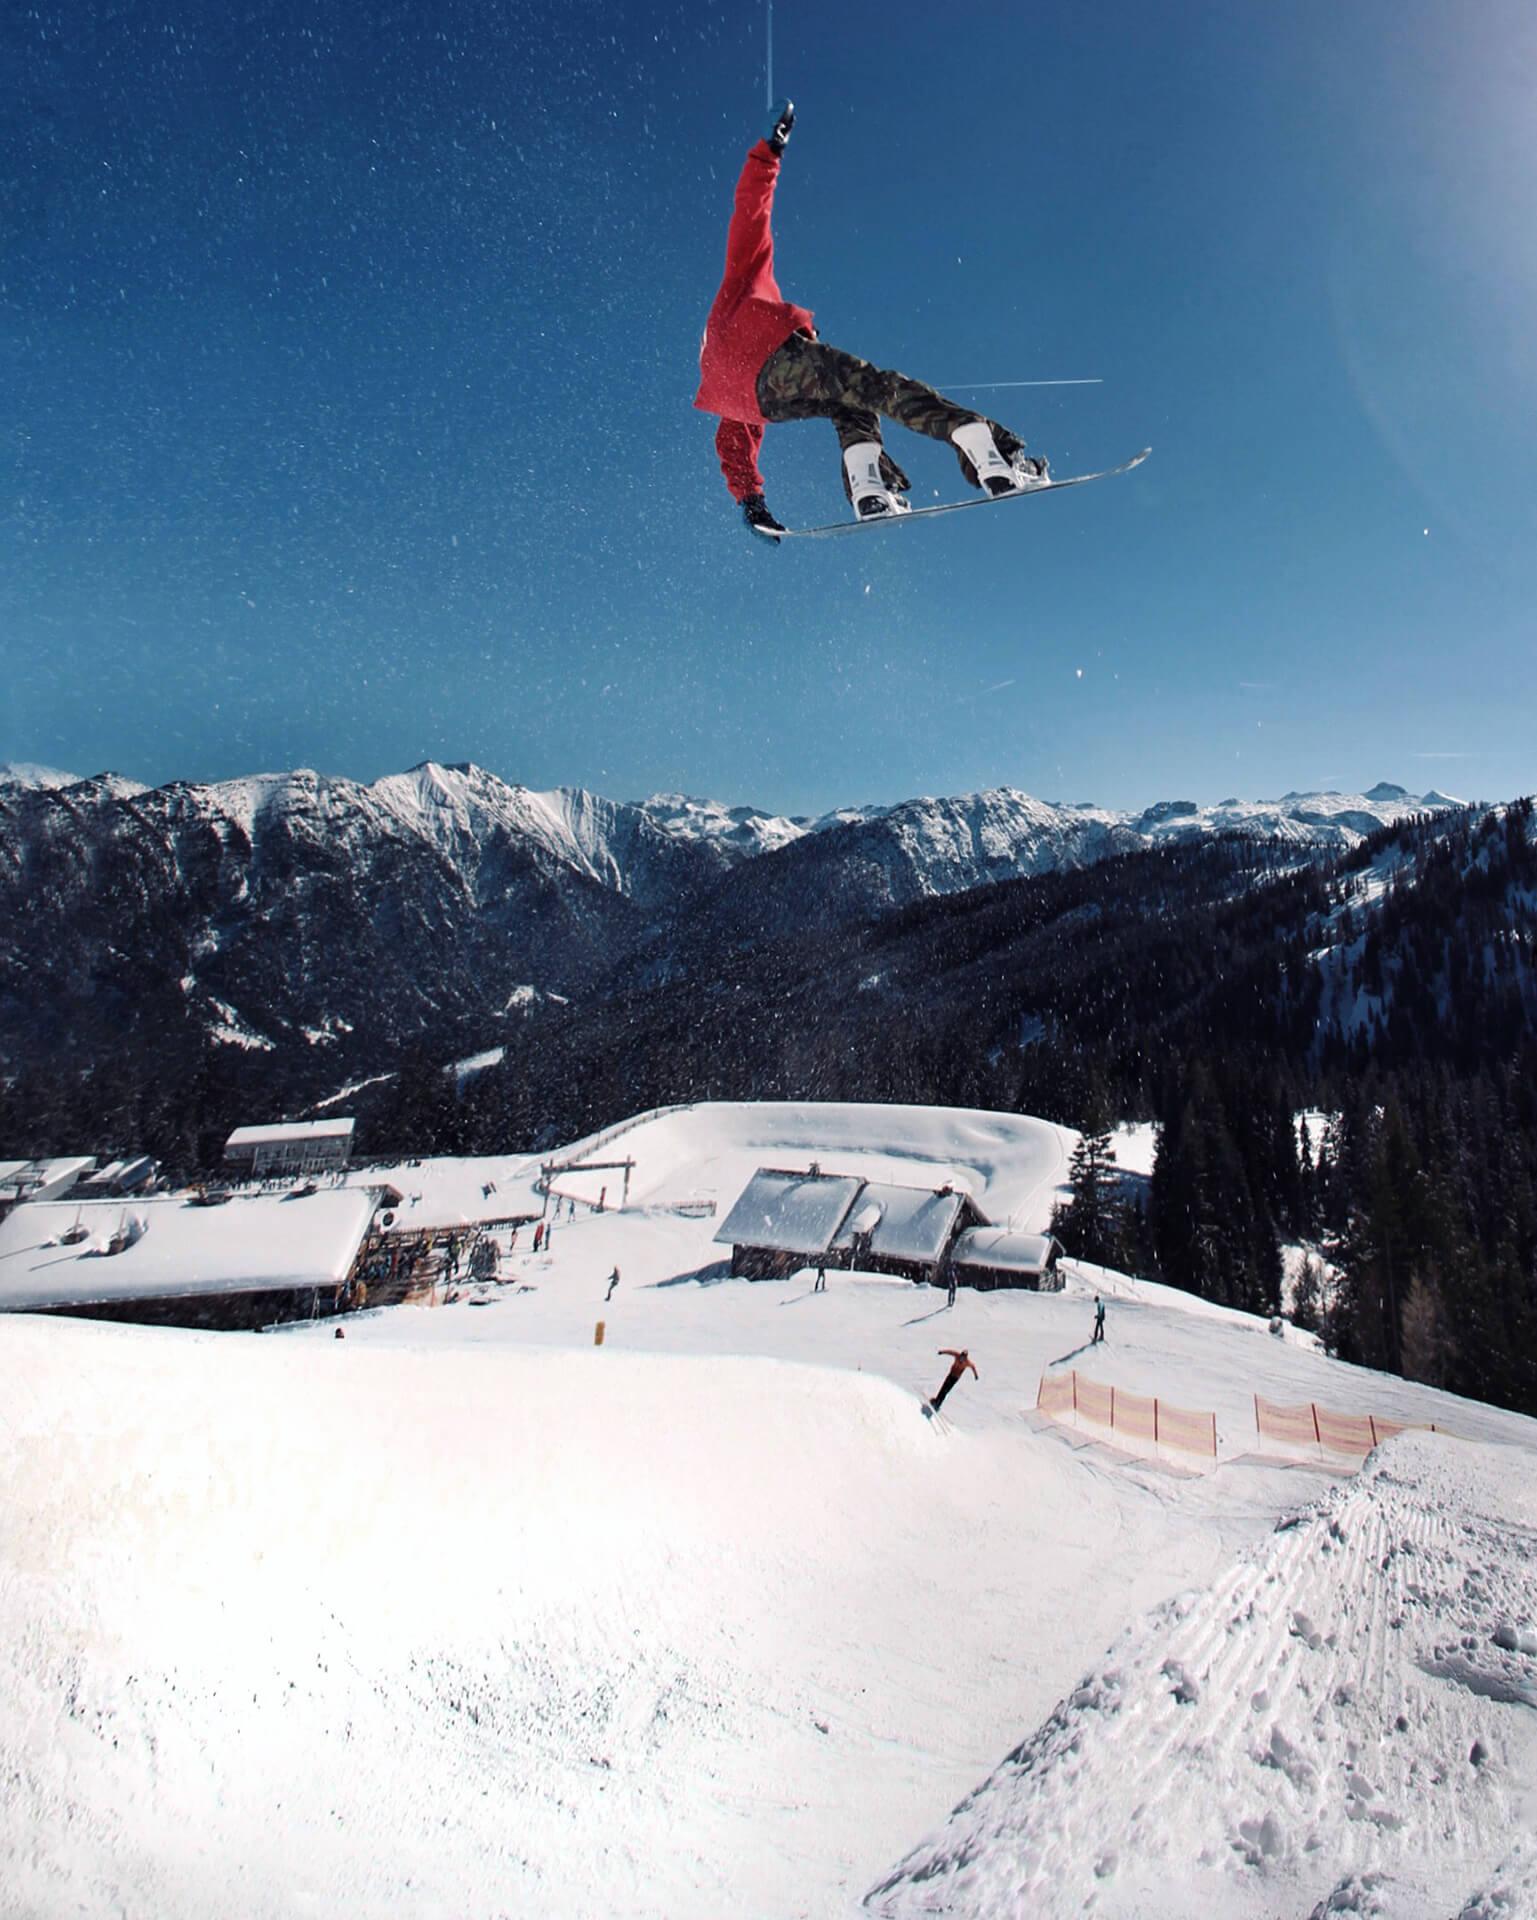 Clemens Millauer: Halfpipe Air @ Absolut Park